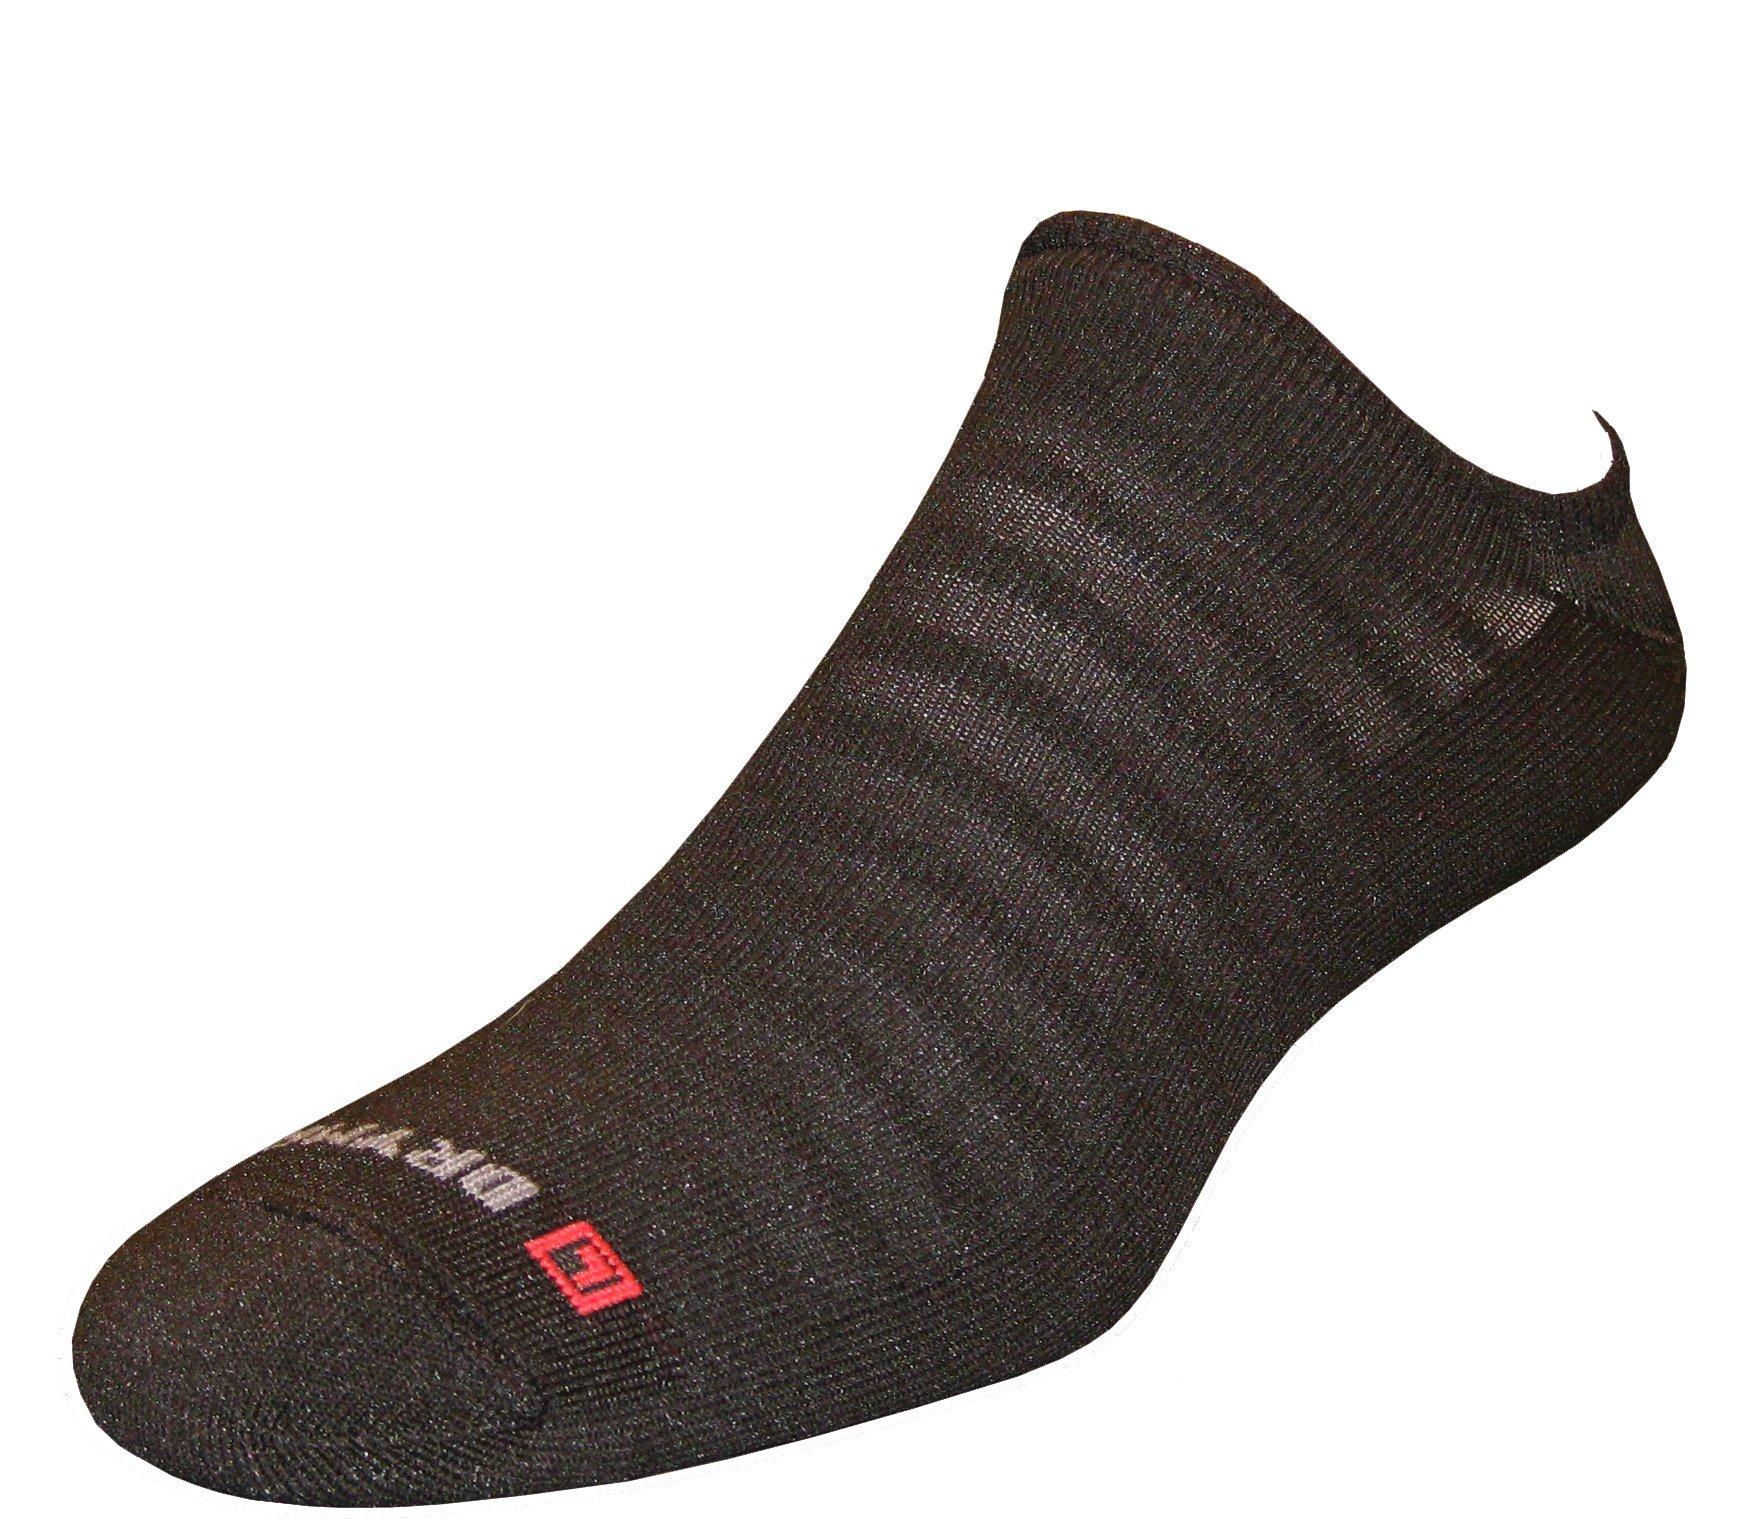 Drymax Run Hyper Thin No Show Socks